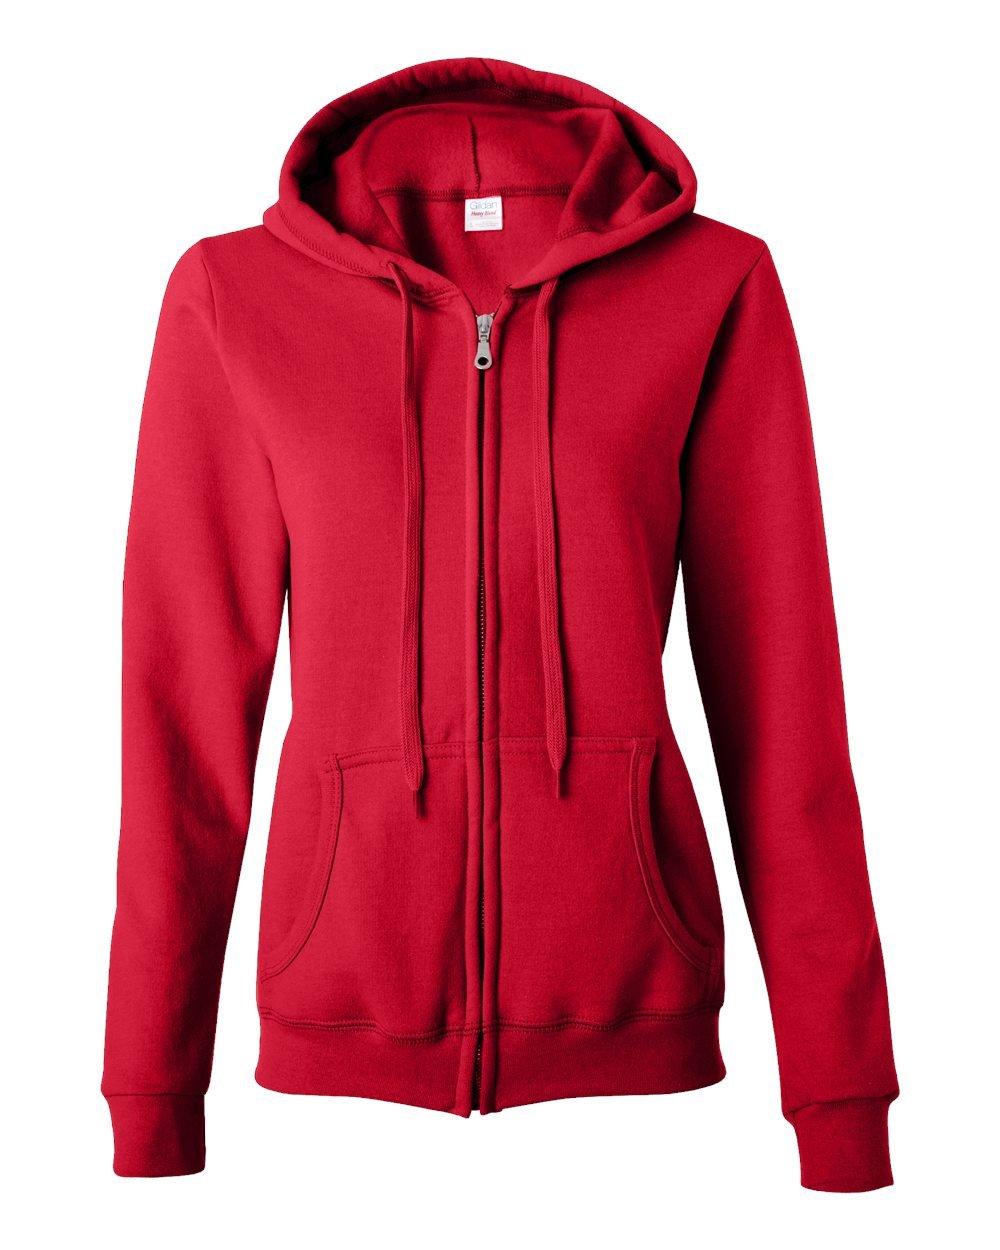 South Carolina   Women Full-Zip Hooded Sweatshirt